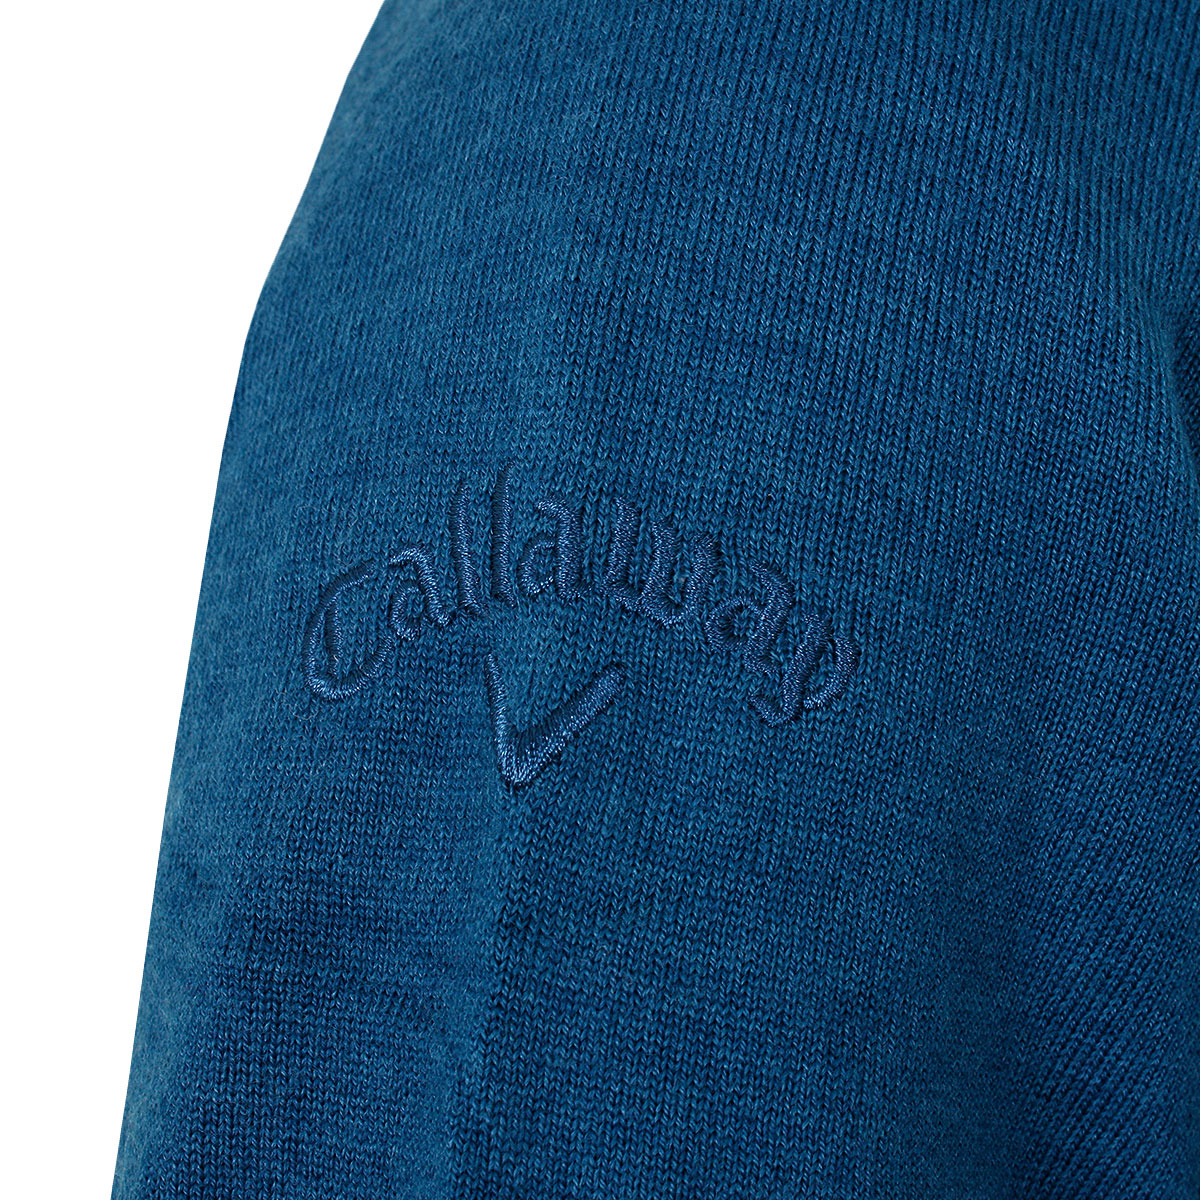 Callaway-Golf-Mens-1-4-Zip-Mock-Merino-Windproof-Sweater-Pullover-43-OFF-RRP thumbnail 10